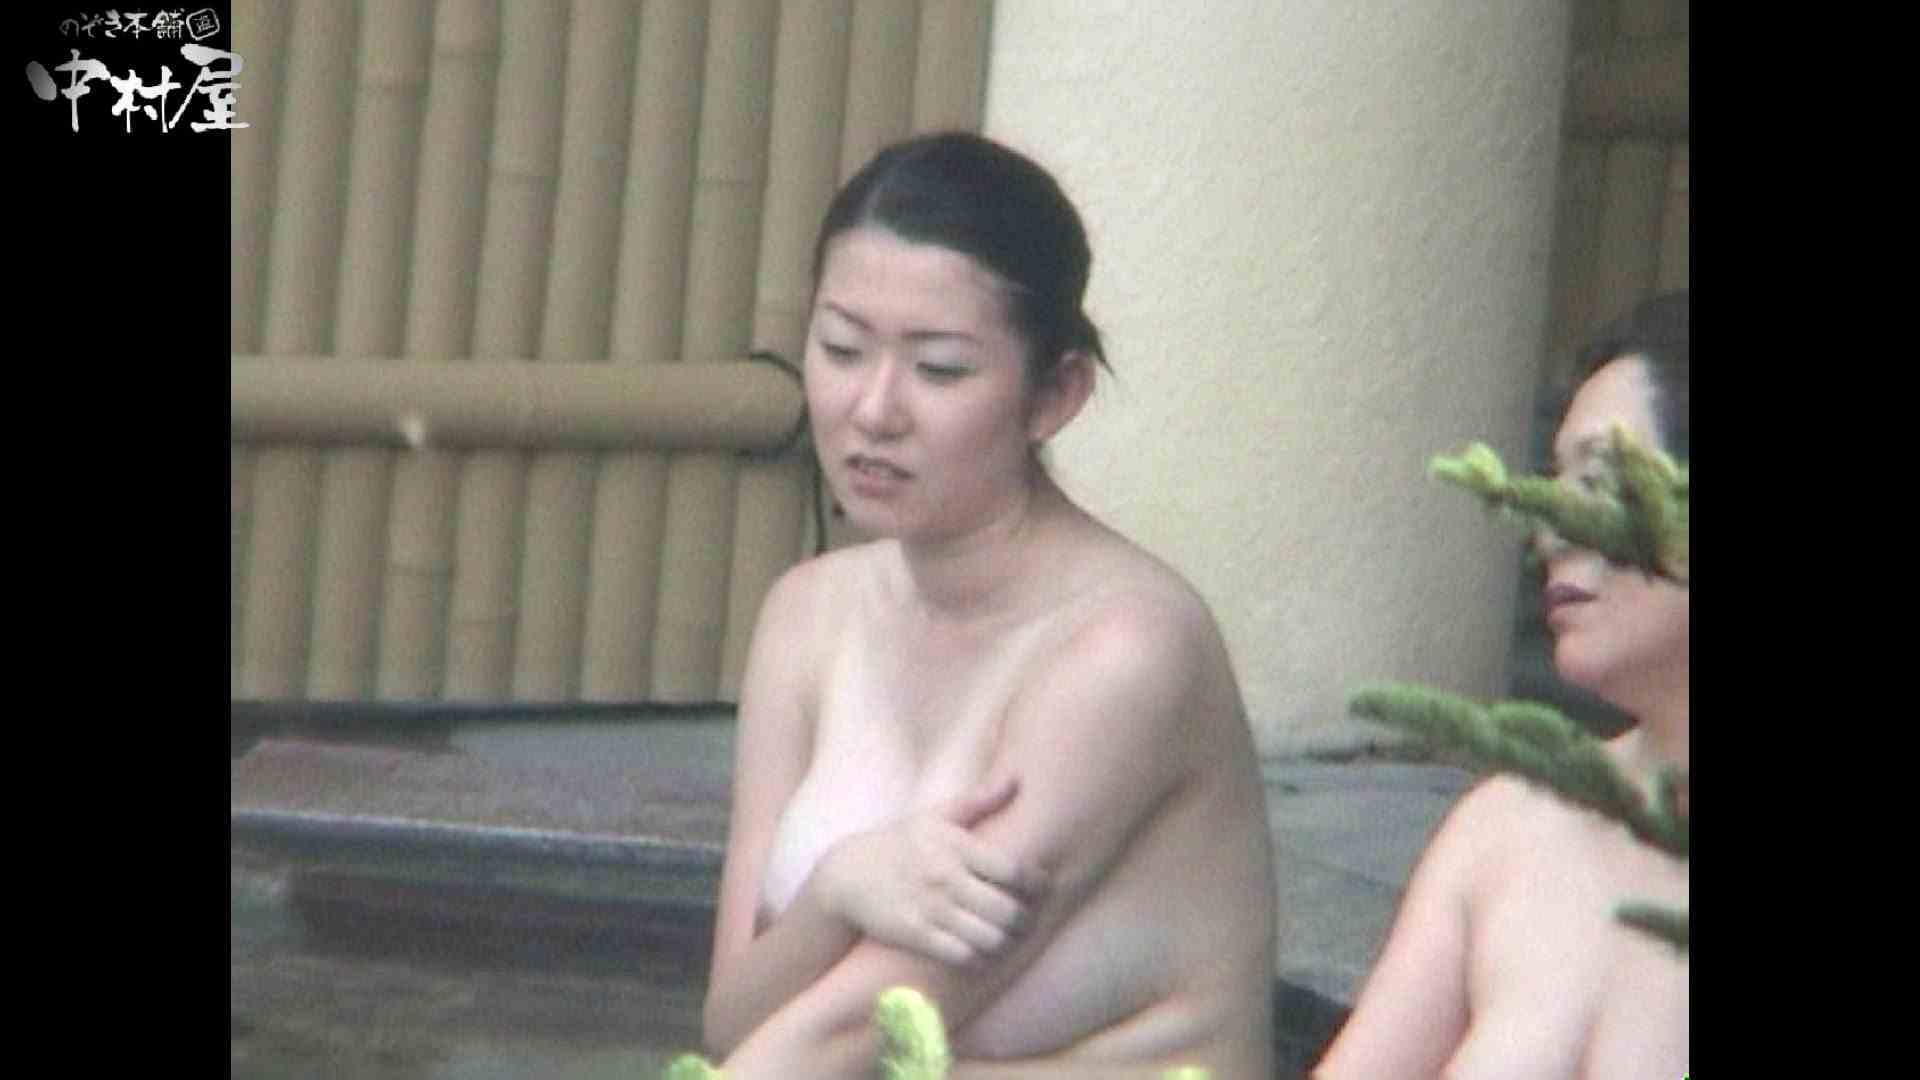 Aquaな露天風呂Vol.961 OLセックス | 盗撮  86画像 16